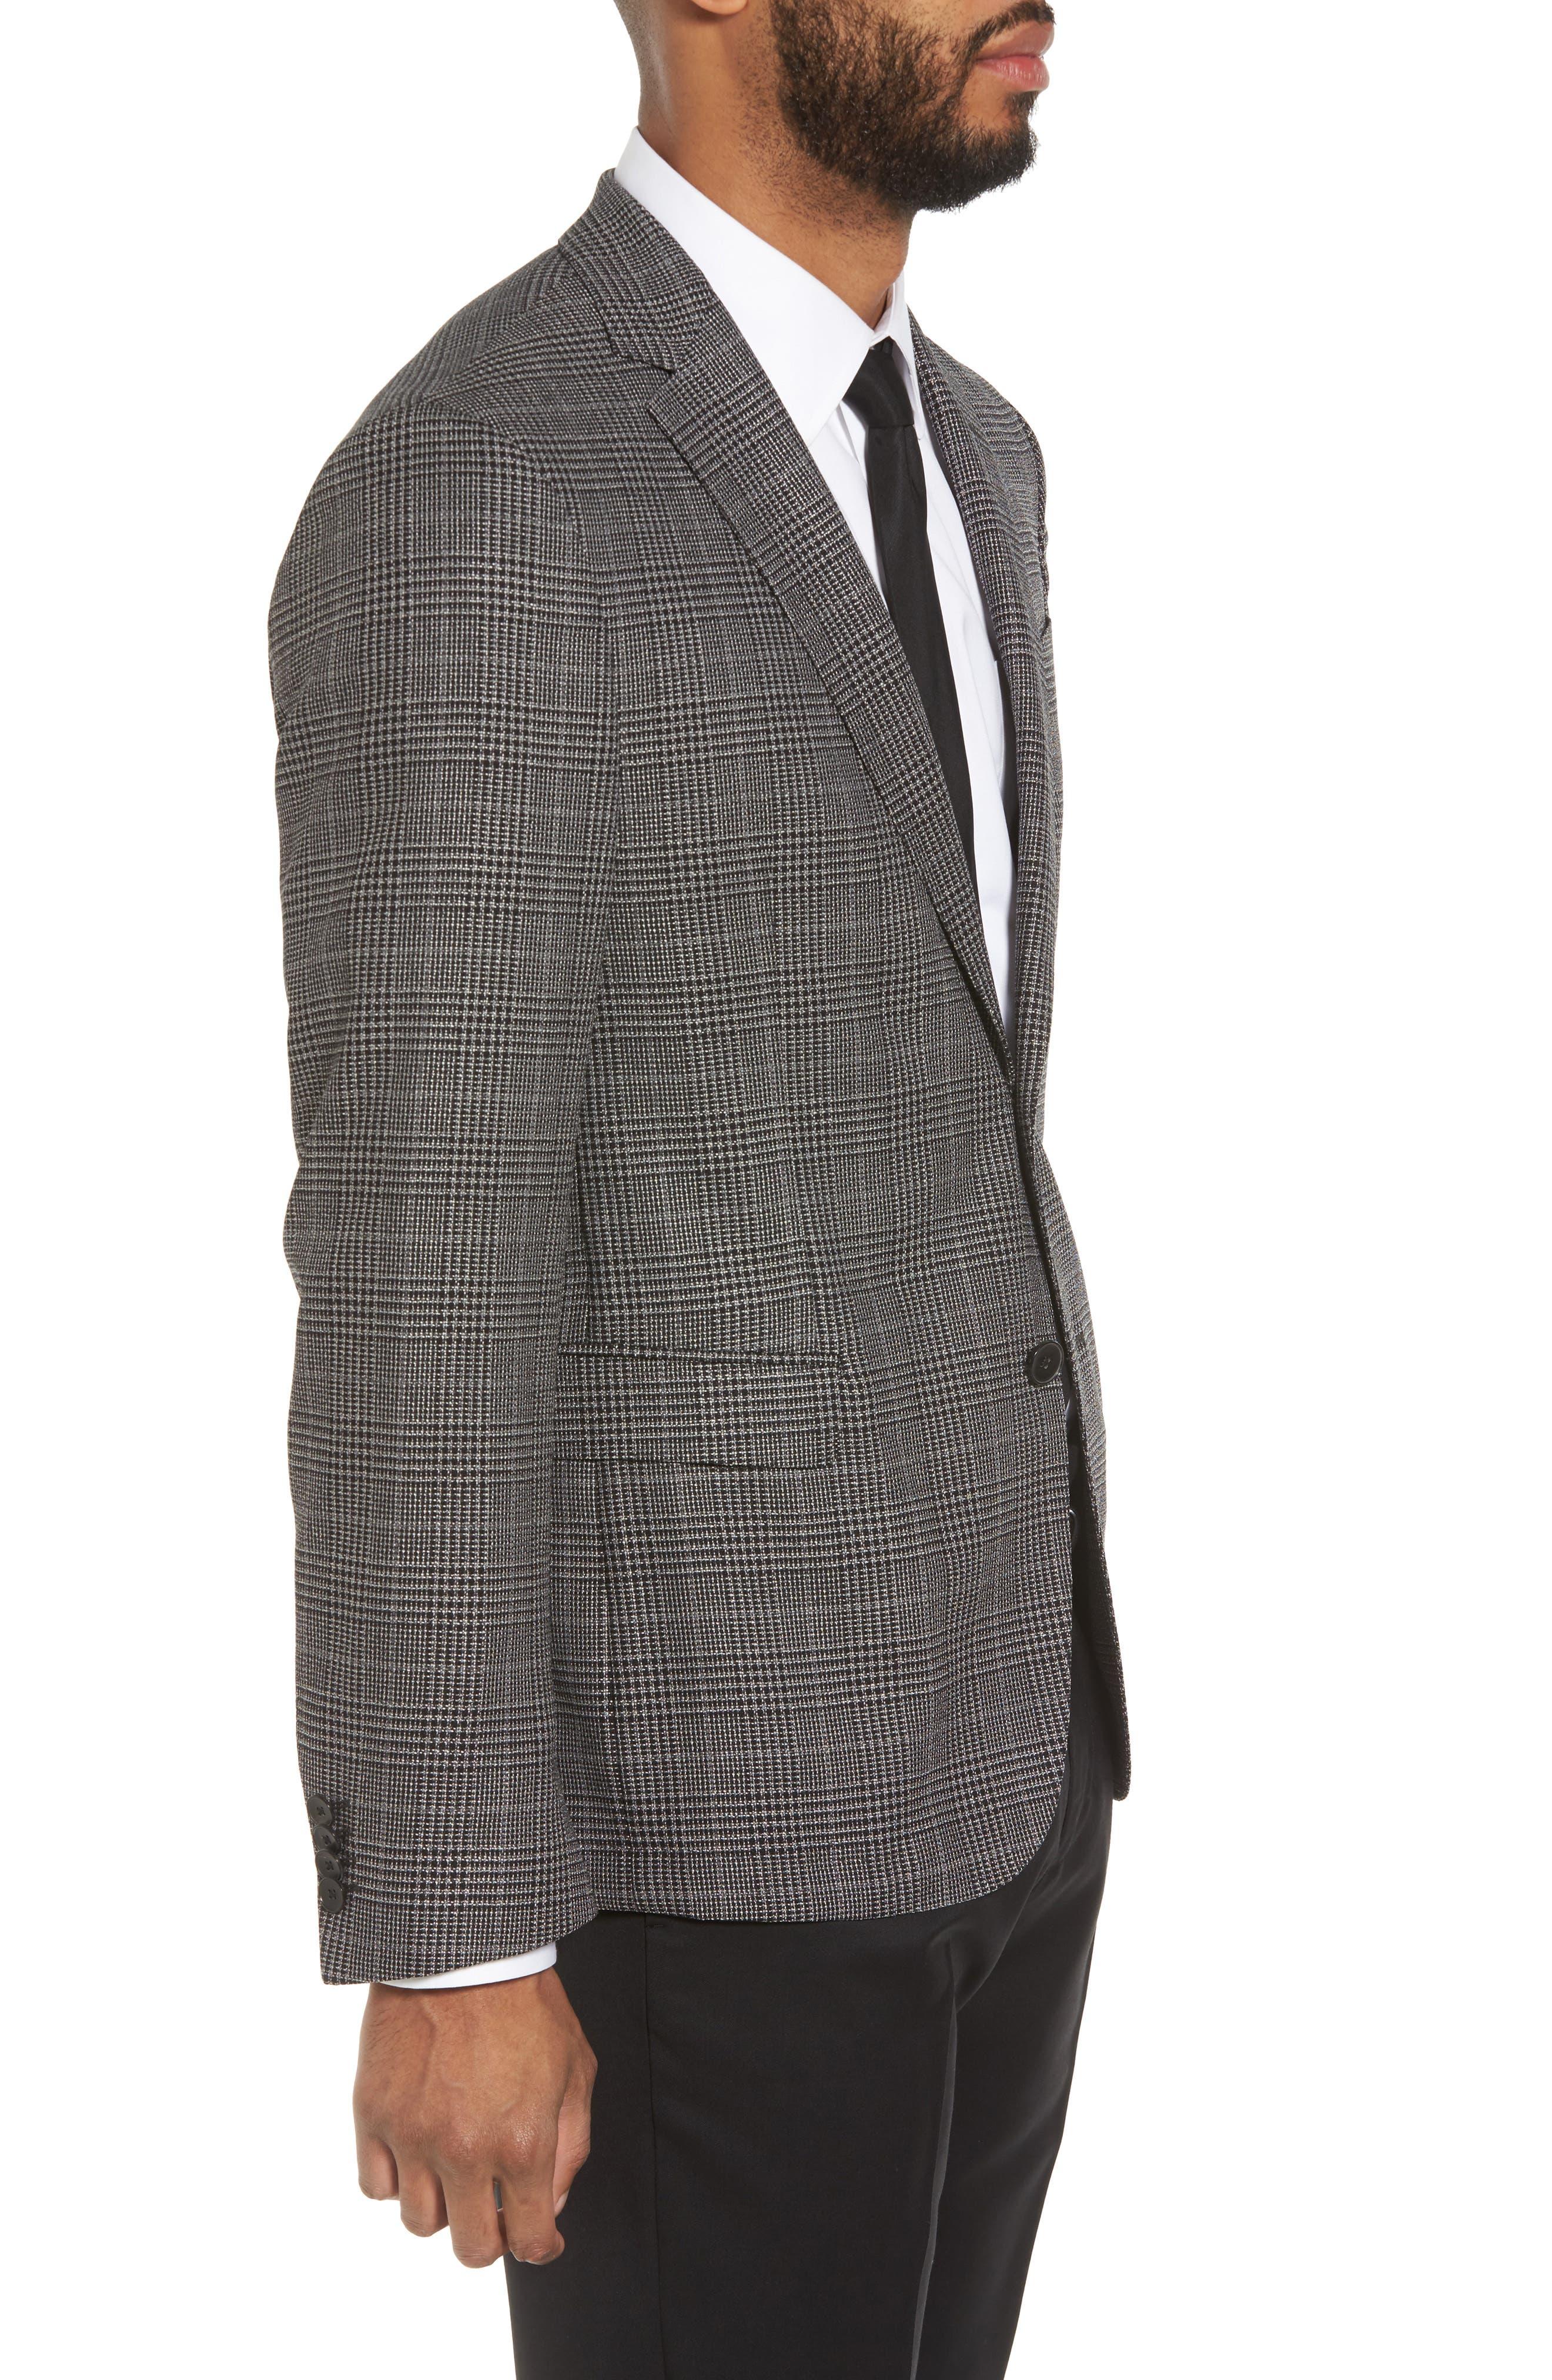 Nobis Trim Fit Plaid Wool & Silk Blend Sport Coat,                             Alternate thumbnail 3, color,                             OPEN GREY